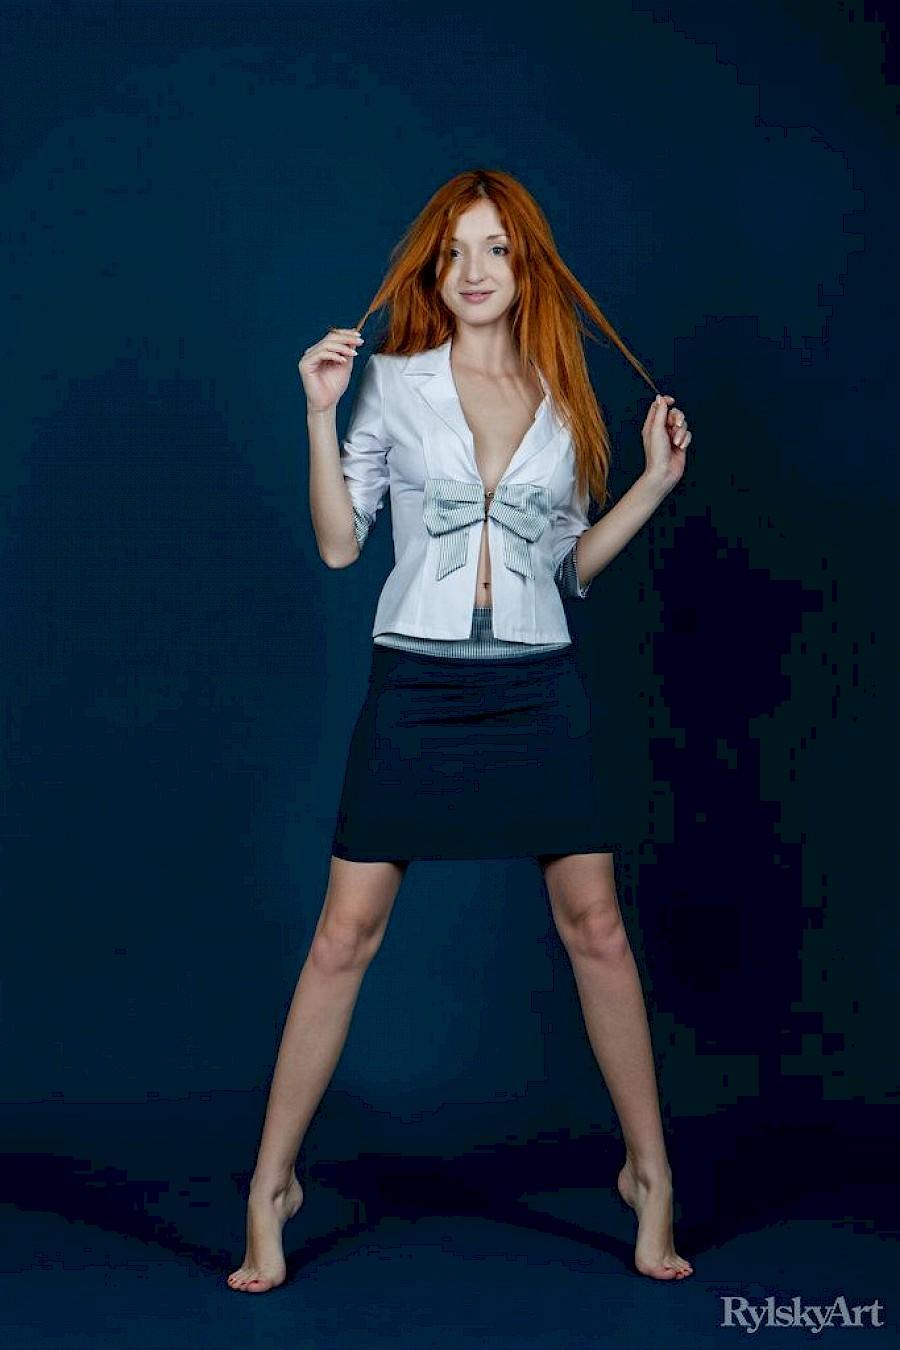 Redhead stripping nude